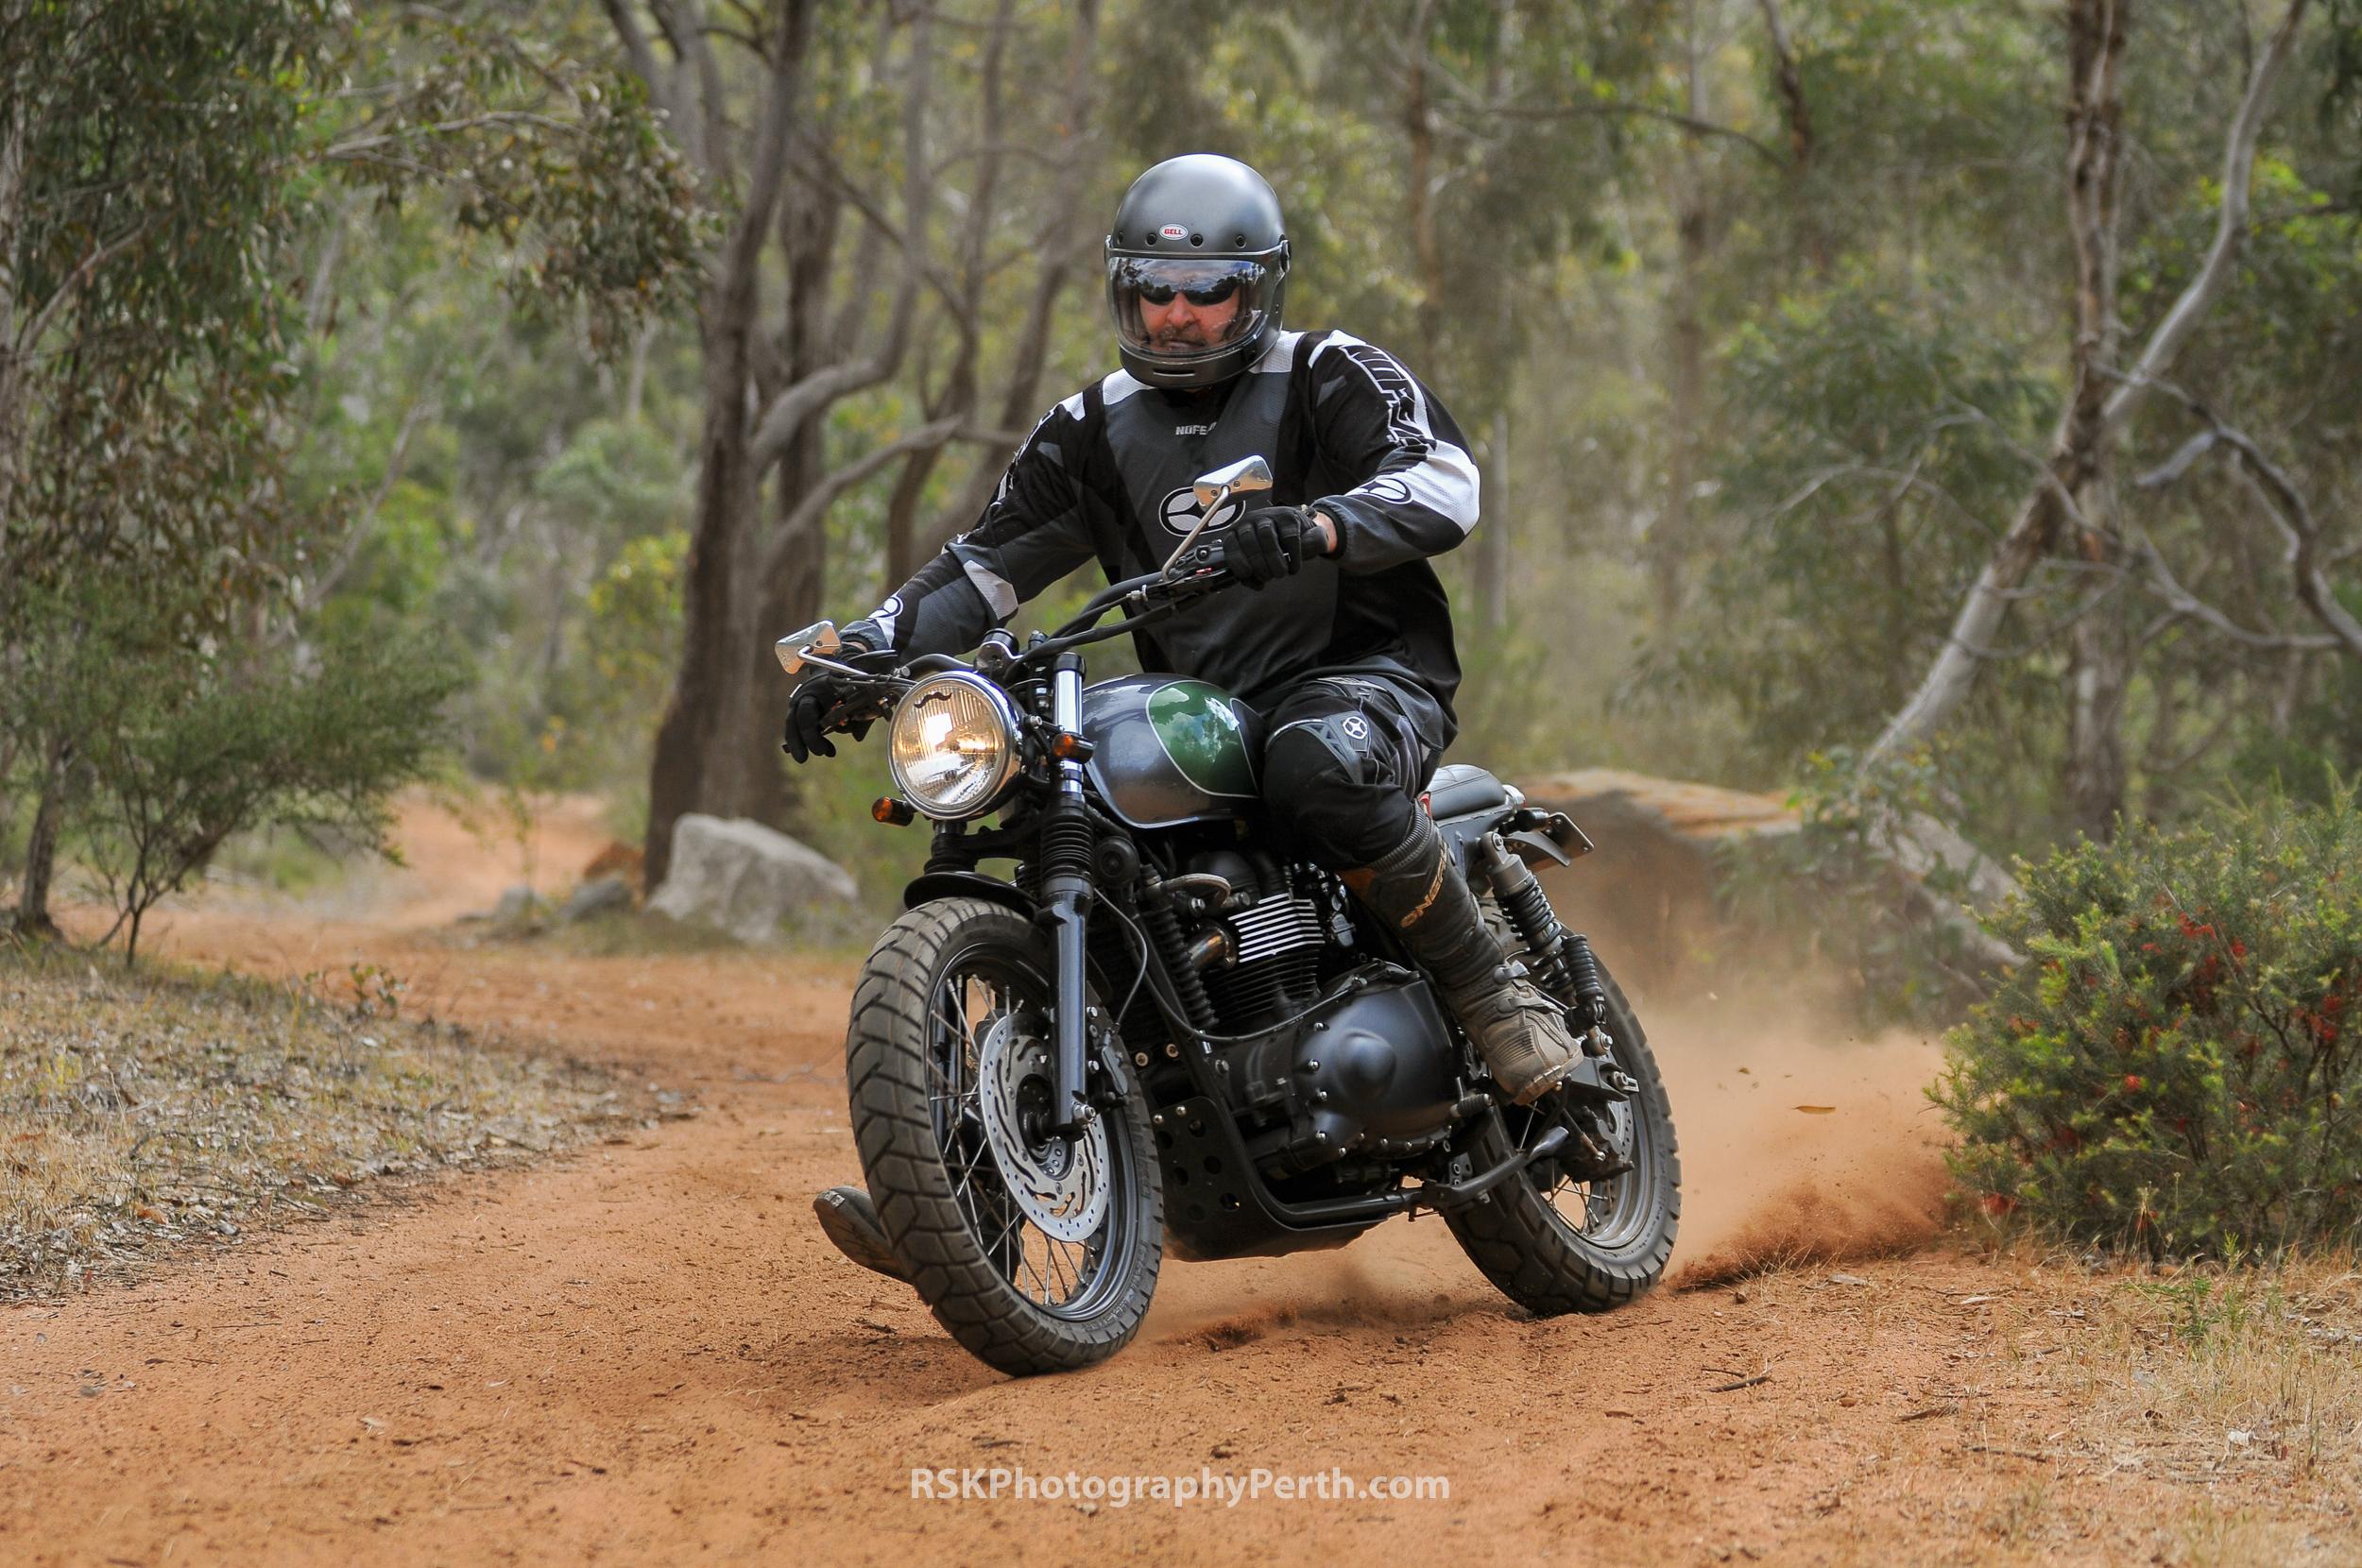 RSK-photography-perth-motorcycle-photographer-triumph-bonneville-22.jpg